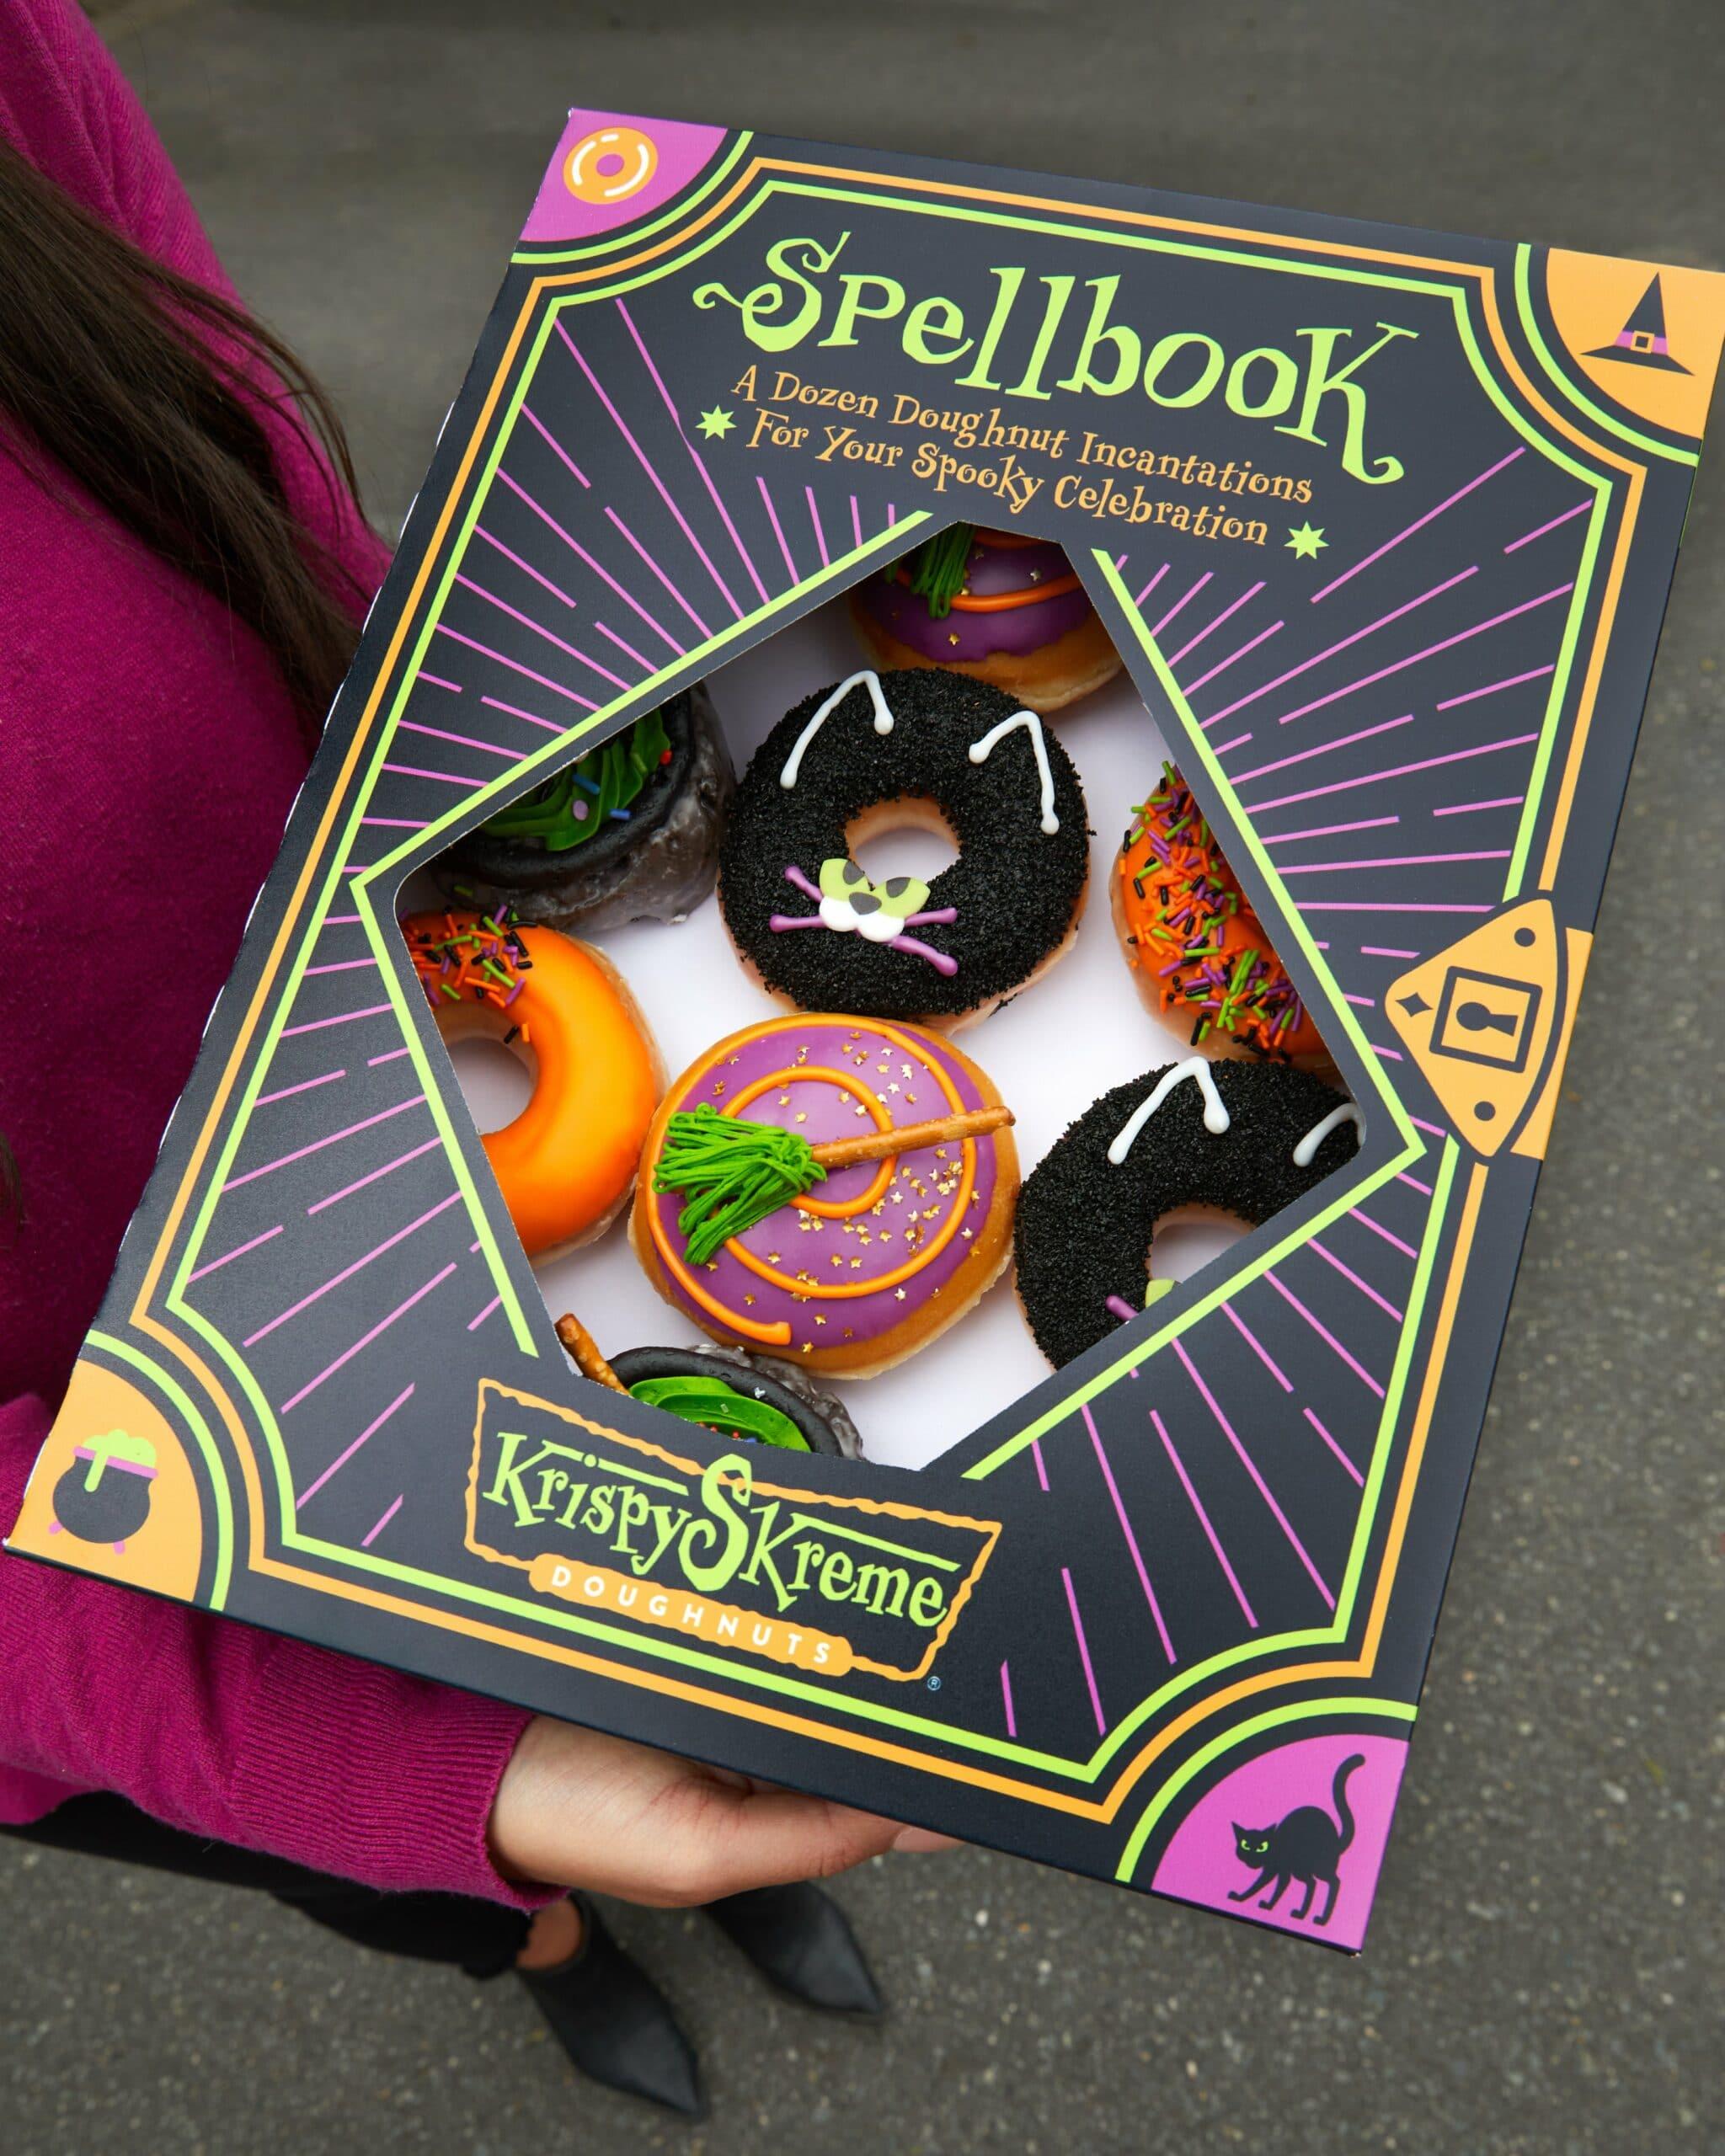 Krispy Kreme changes its name to Krispy Skreme, unveils four Halloween doughnuts 15